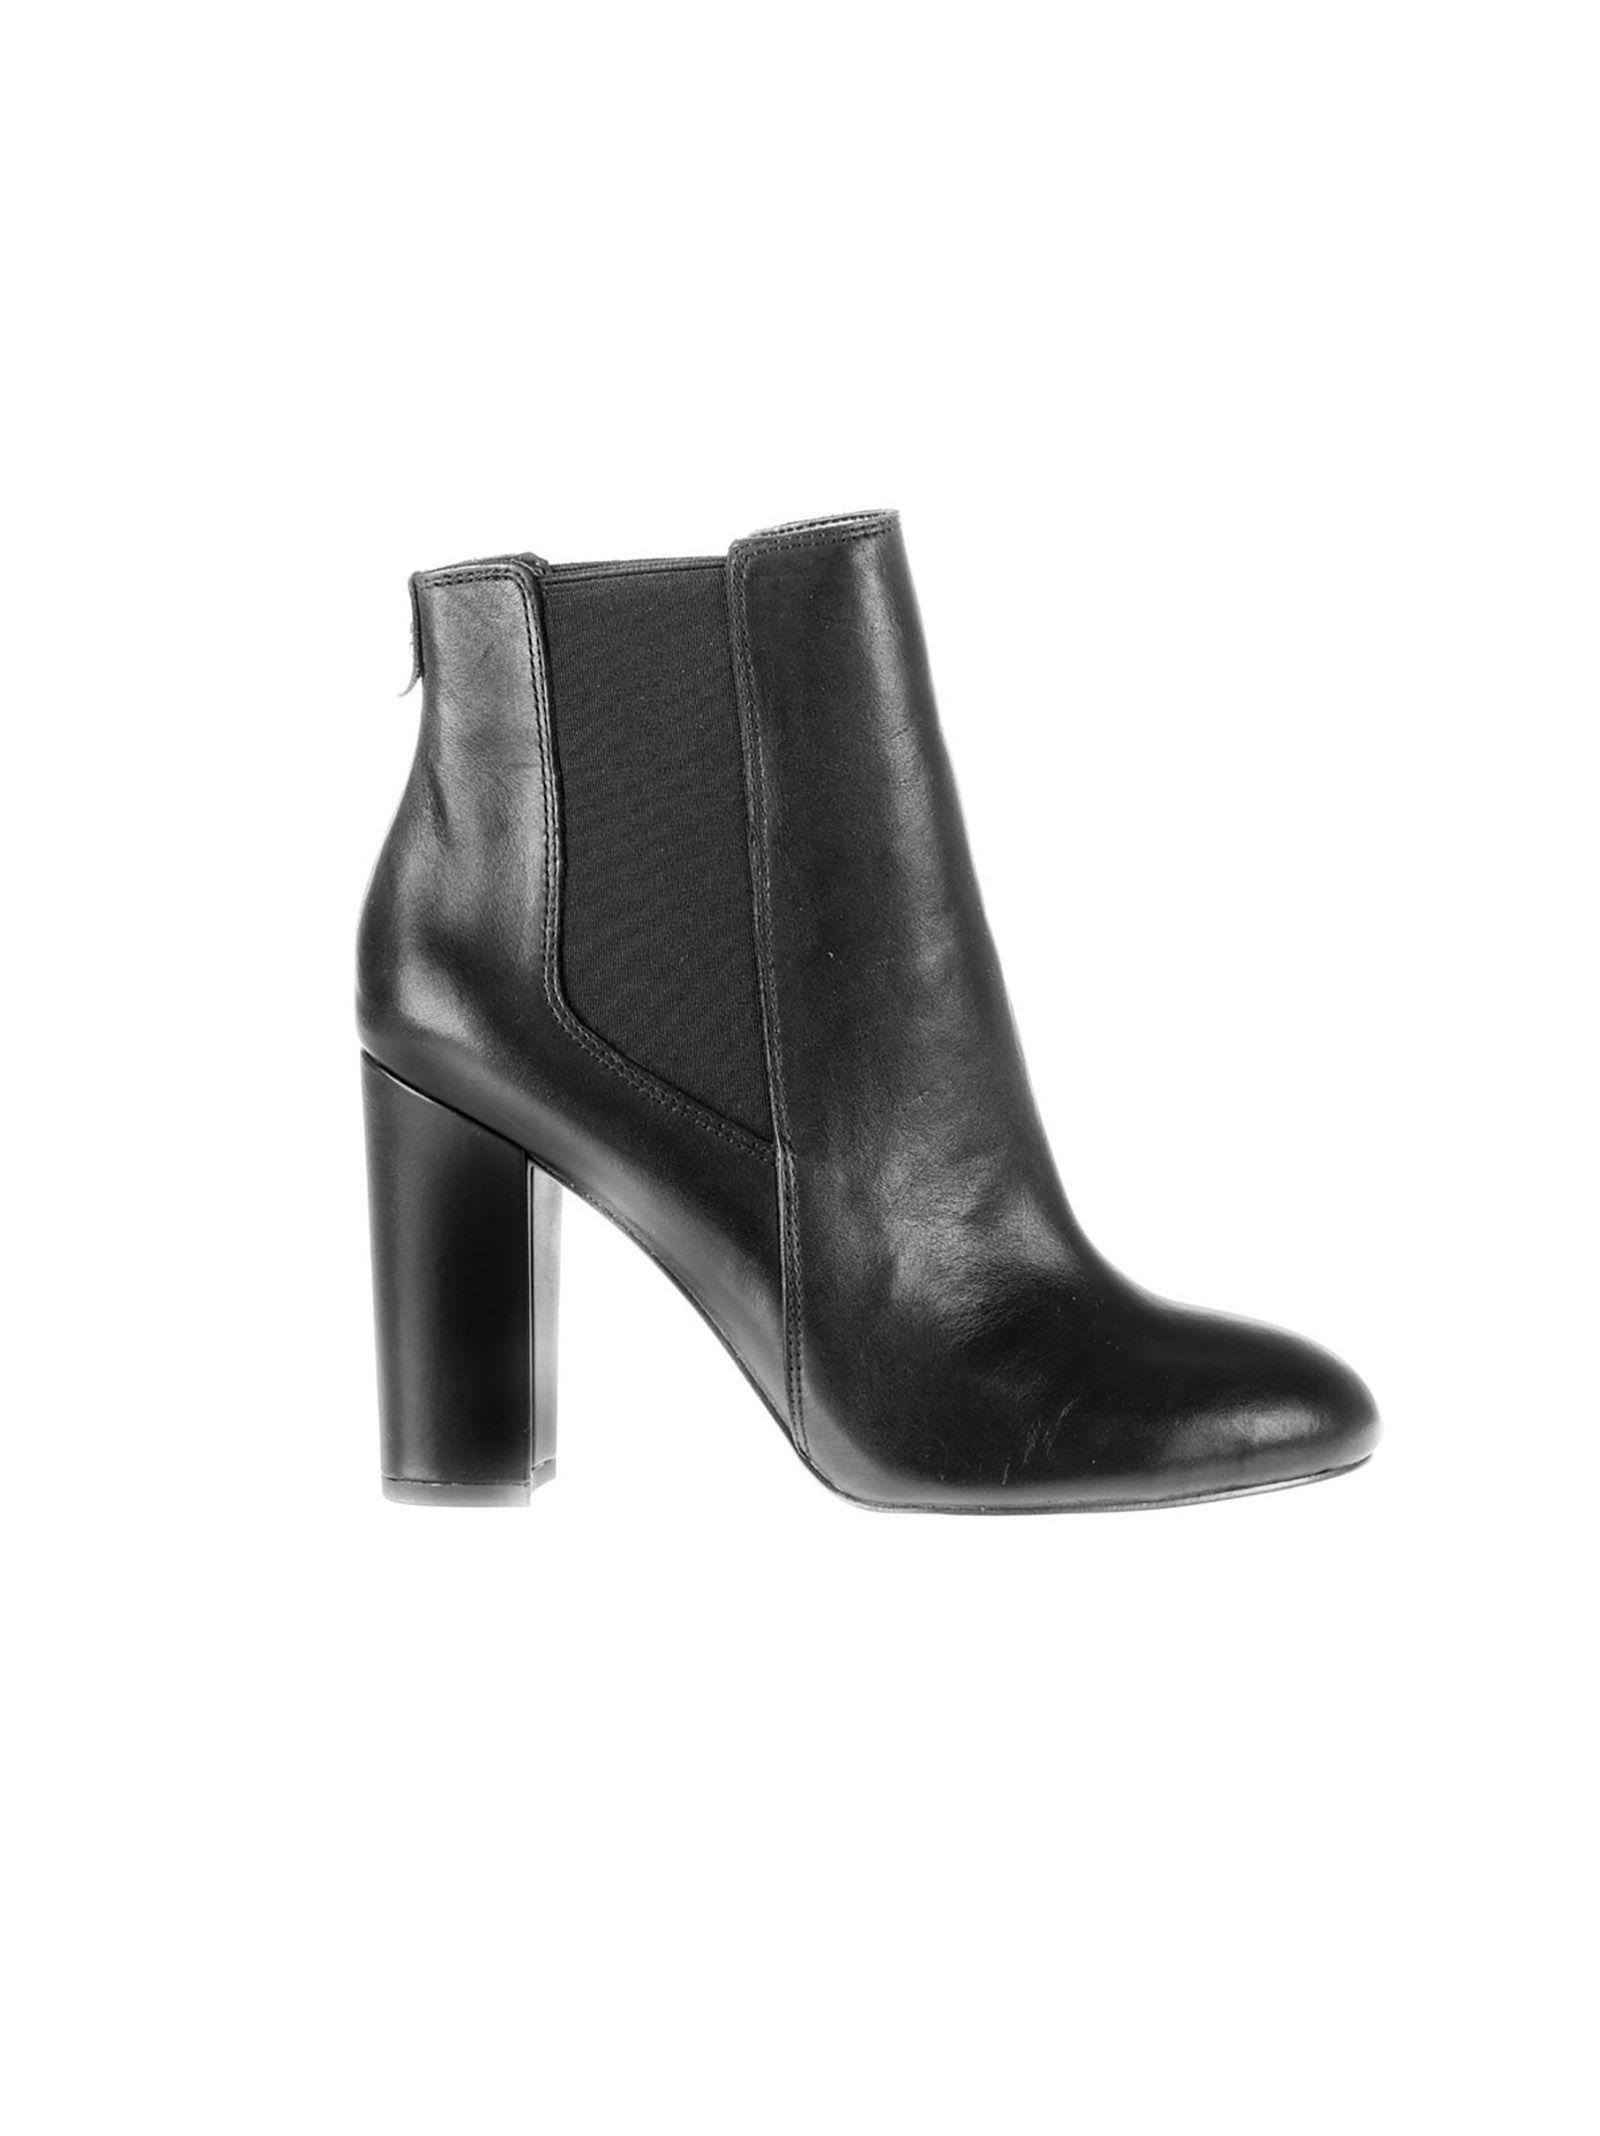 470ffd56bbeb Sam Edelman Sam Edelman Case Ankle Boots - Black - 8426530